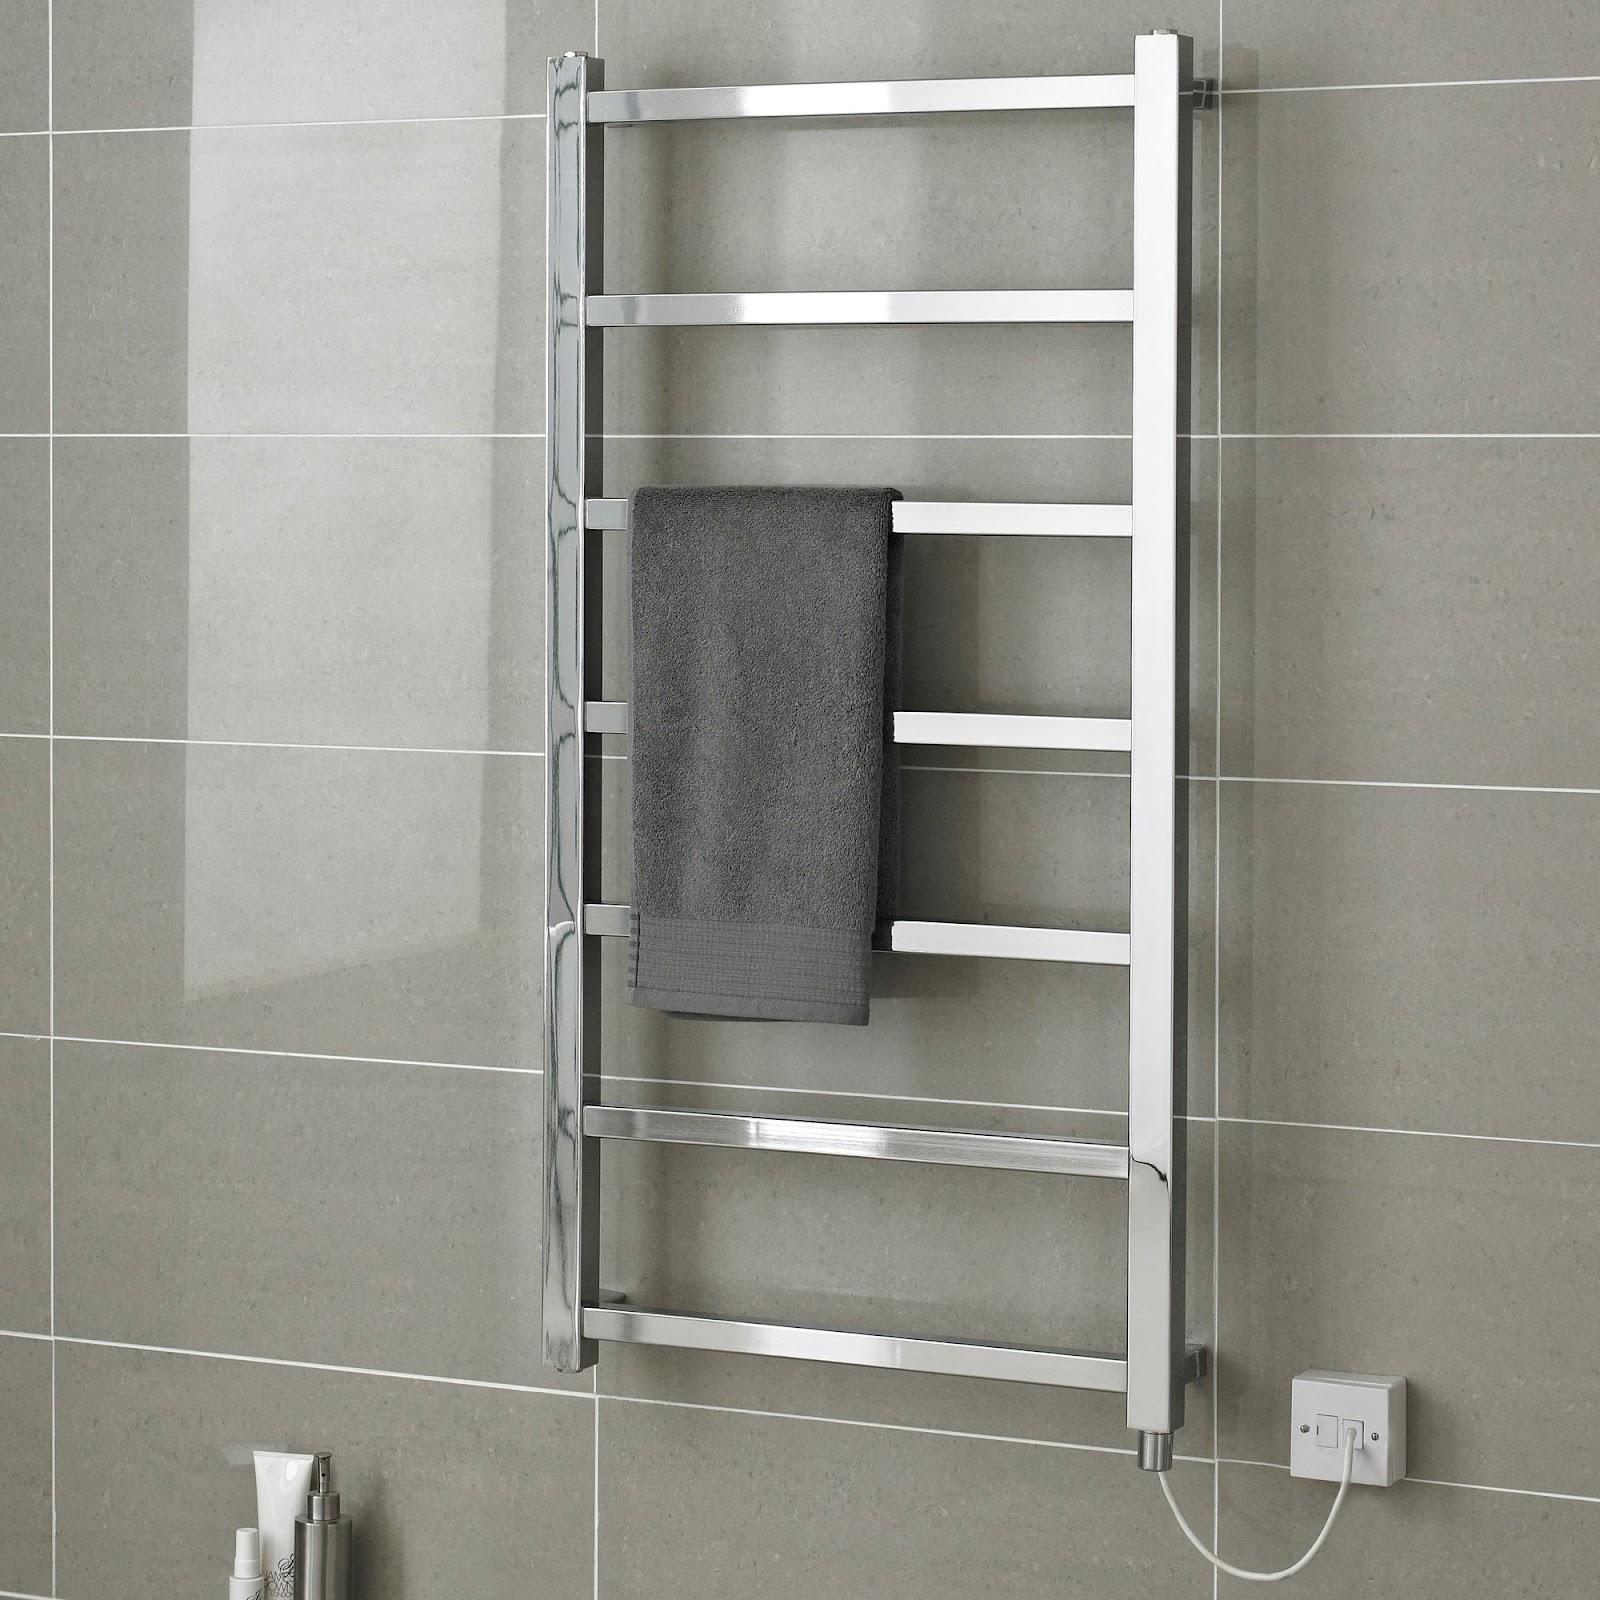 Eton+Wall+Mount+Electric+Heated+Towel+Rail.jpg